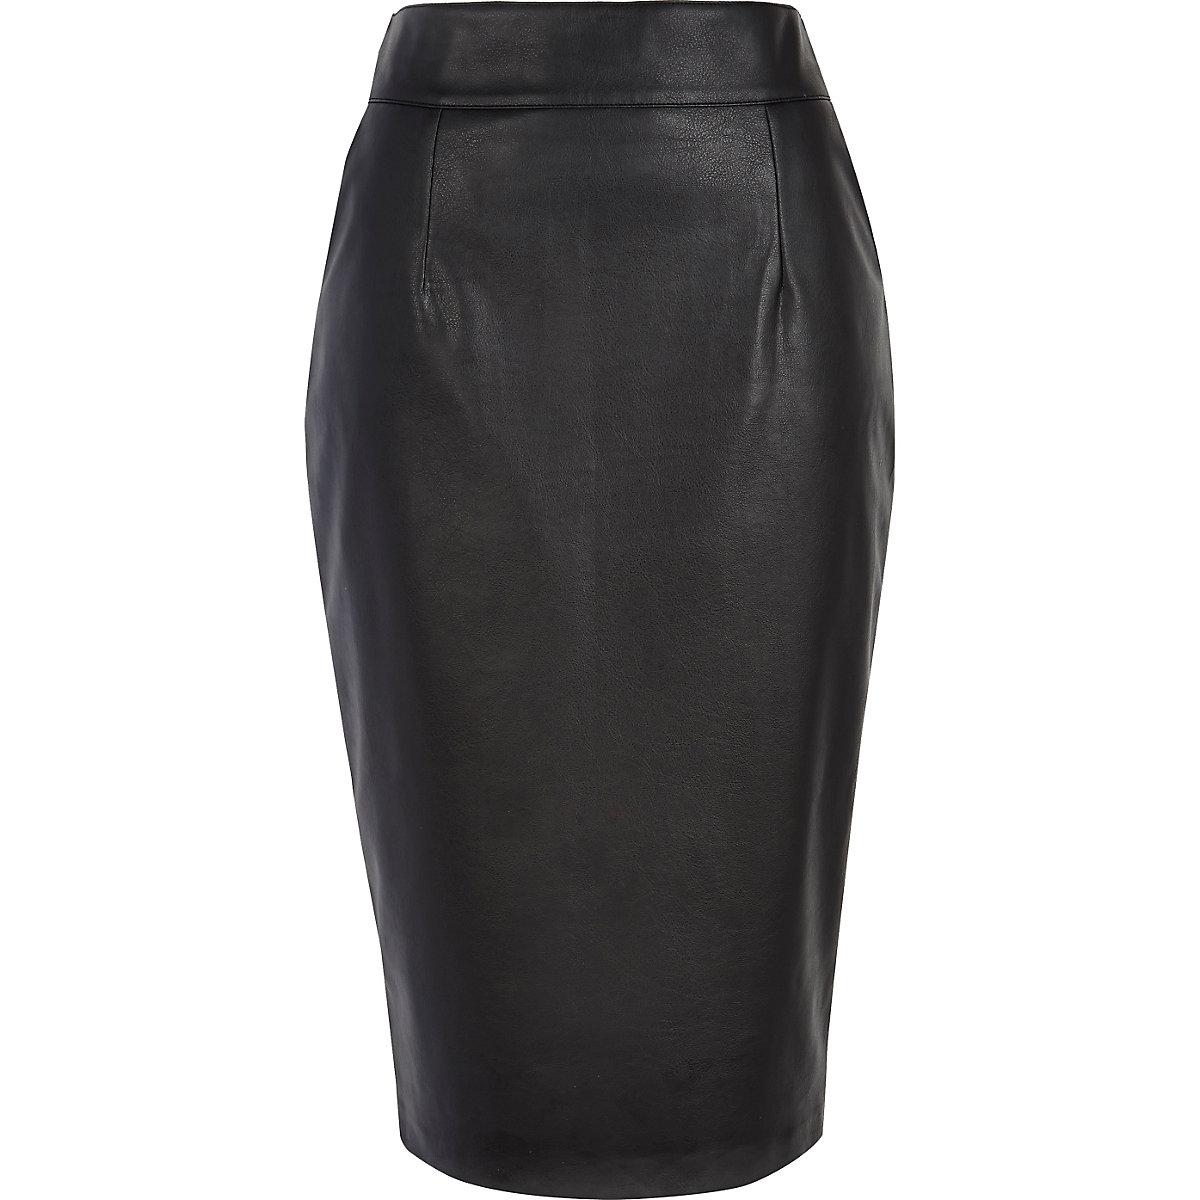 Black high waisted leather-look pencil skirt